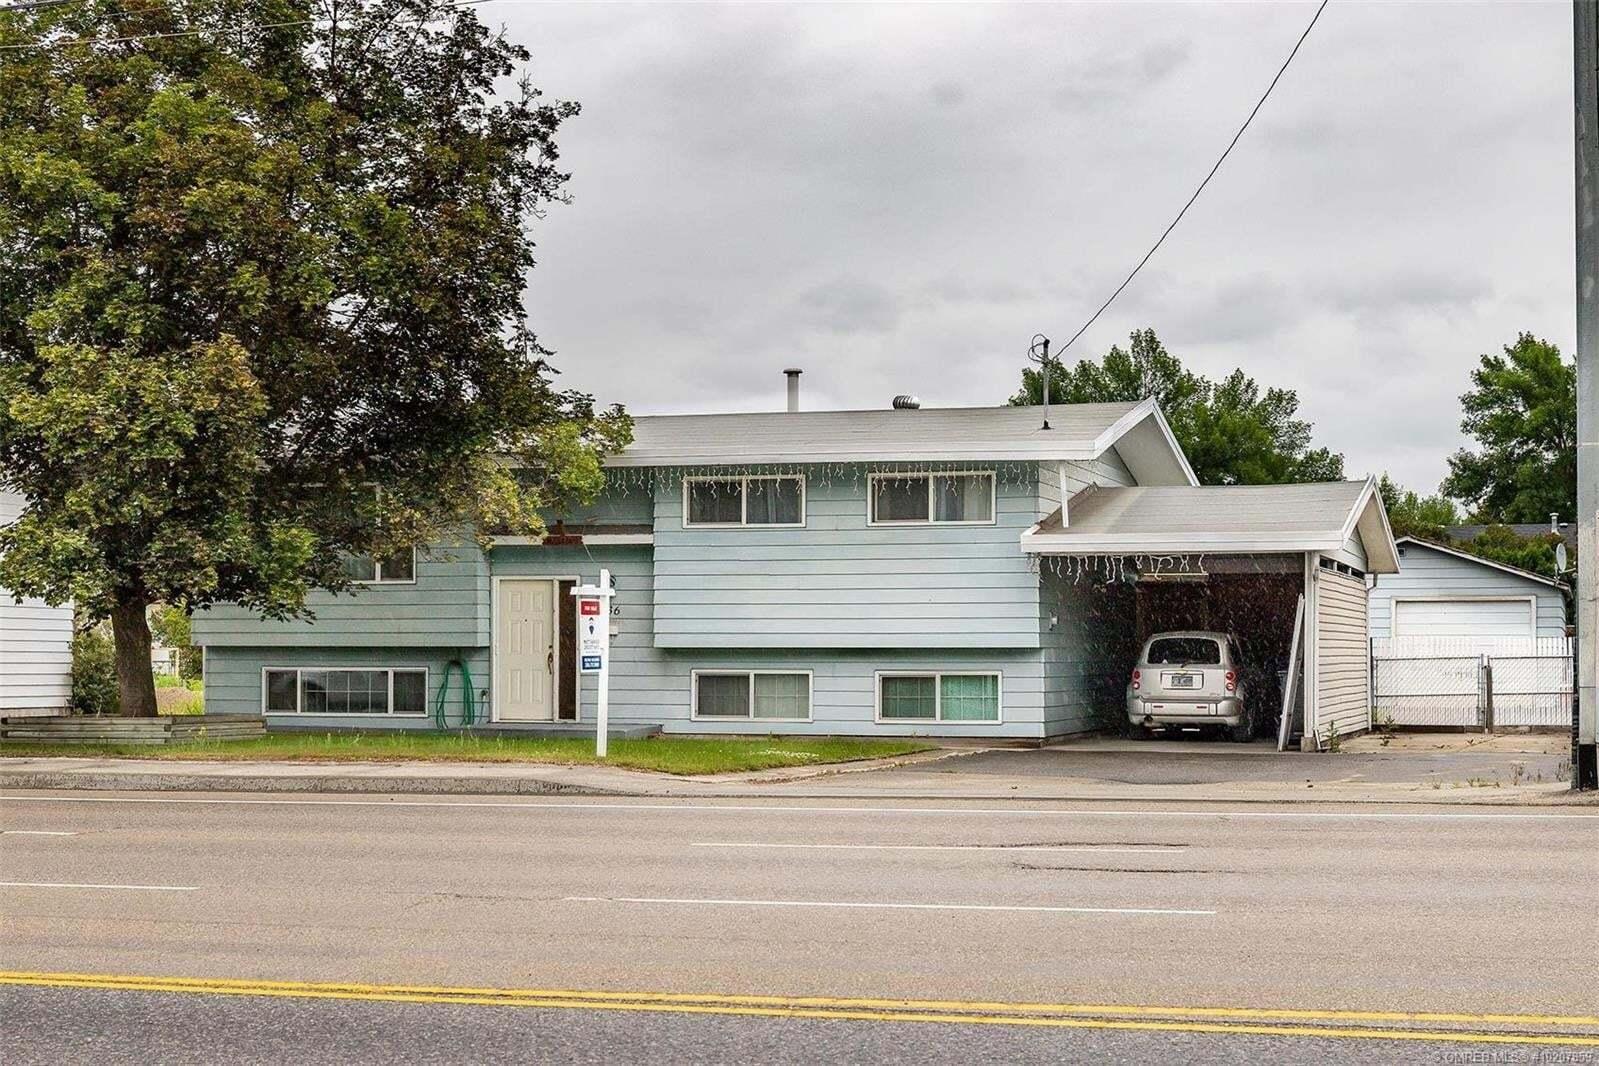 House for sale at 2736 Springfield Rd Kelowna British Columbia - MLS: 10207859